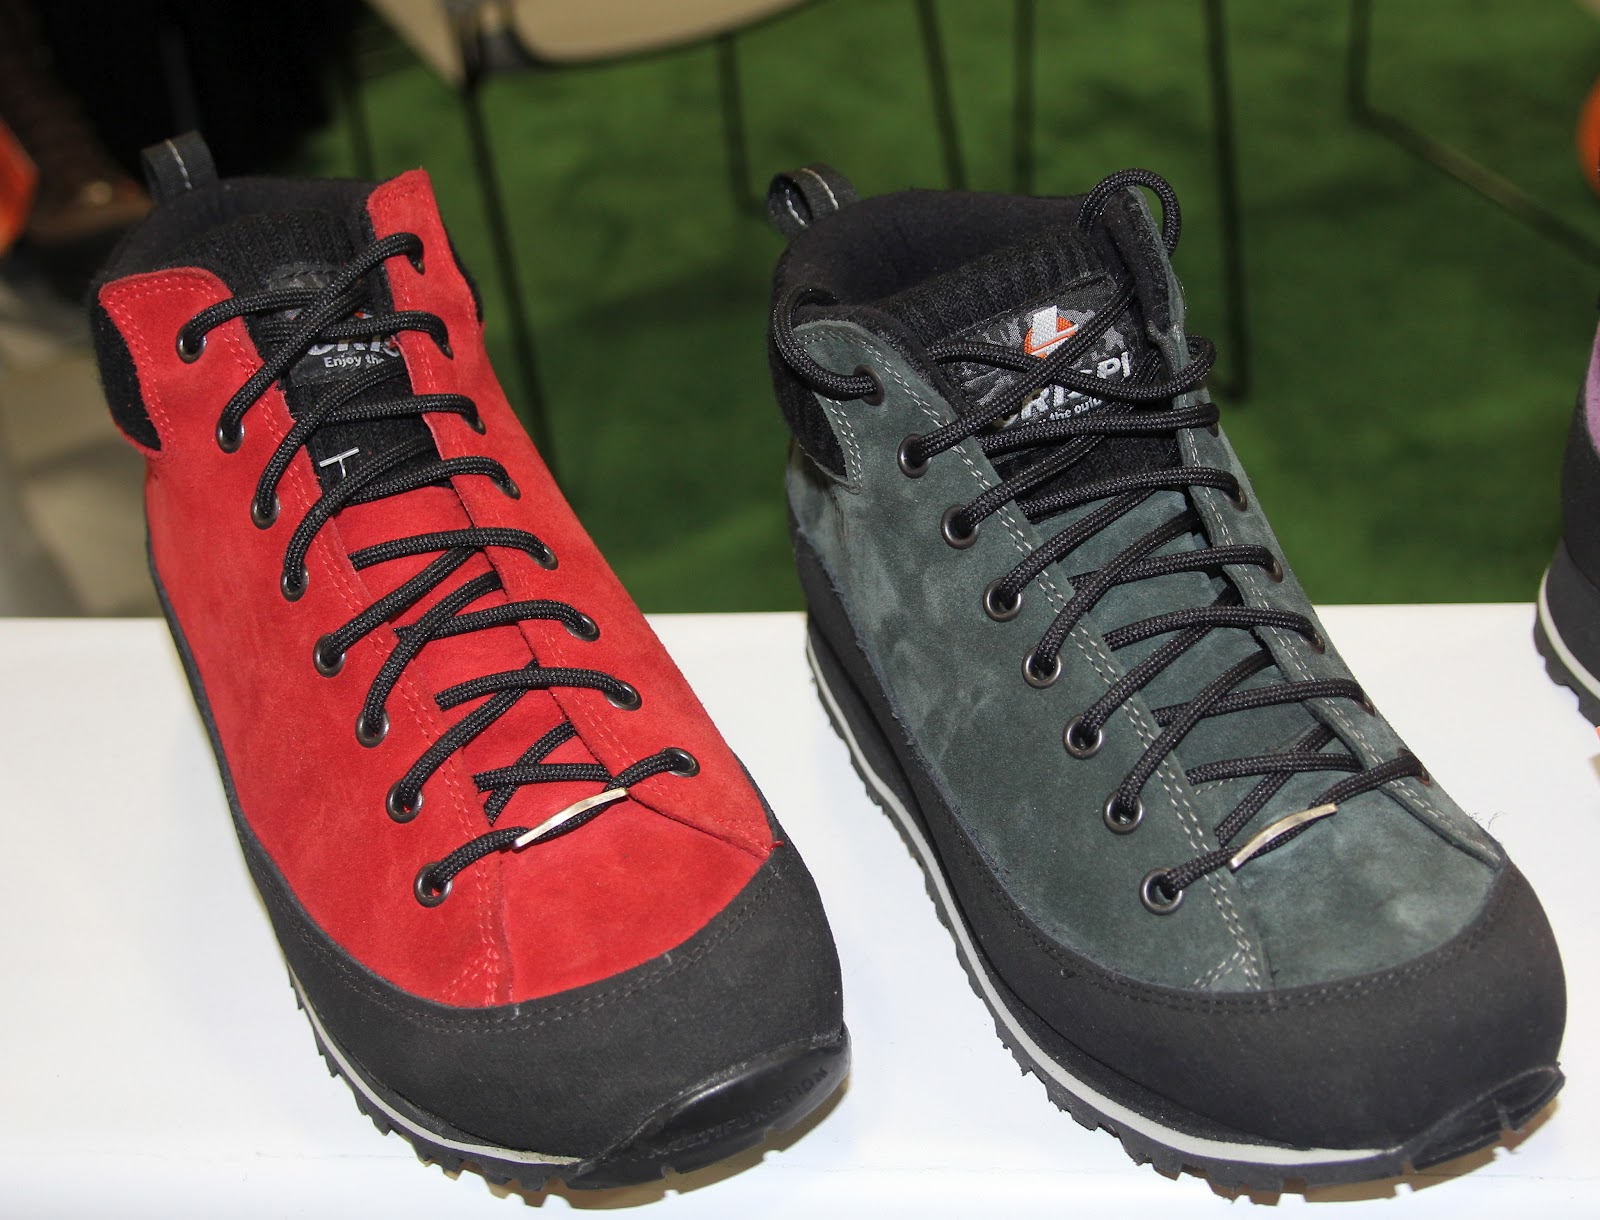 Crispi Fall 2012 Performance Footwear Hike Trek